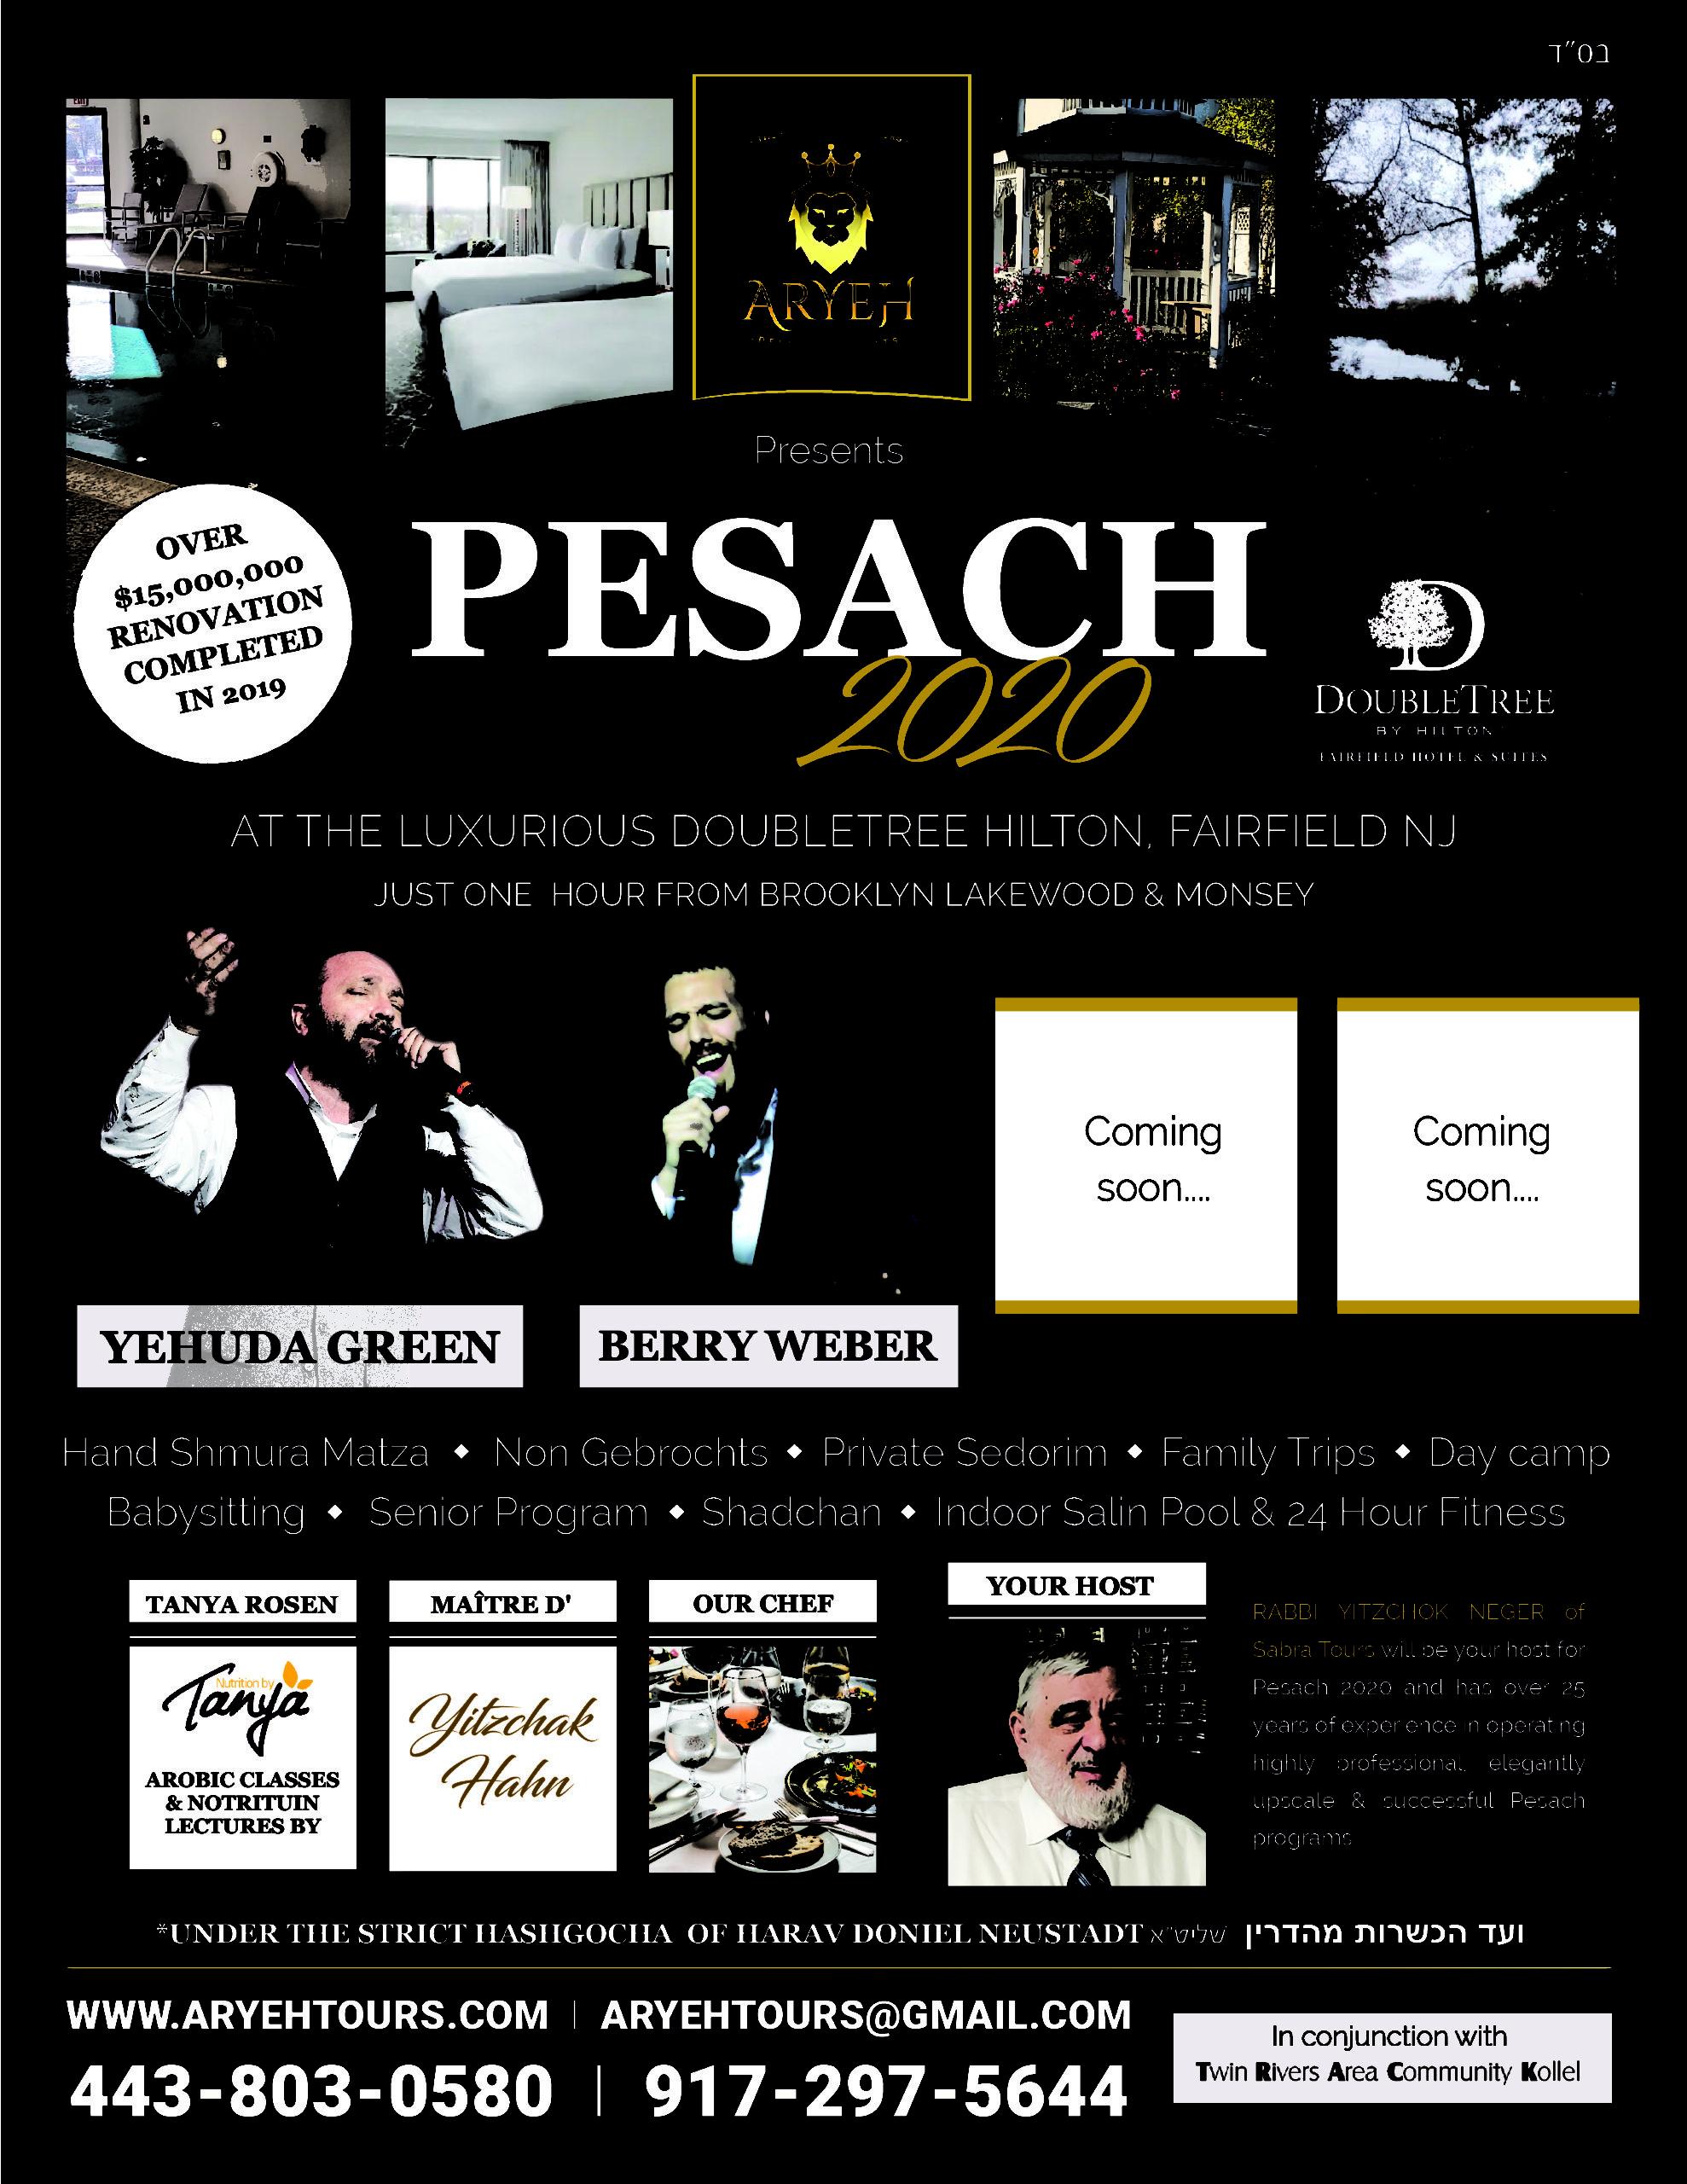 Pesach hotel final-01 (2)